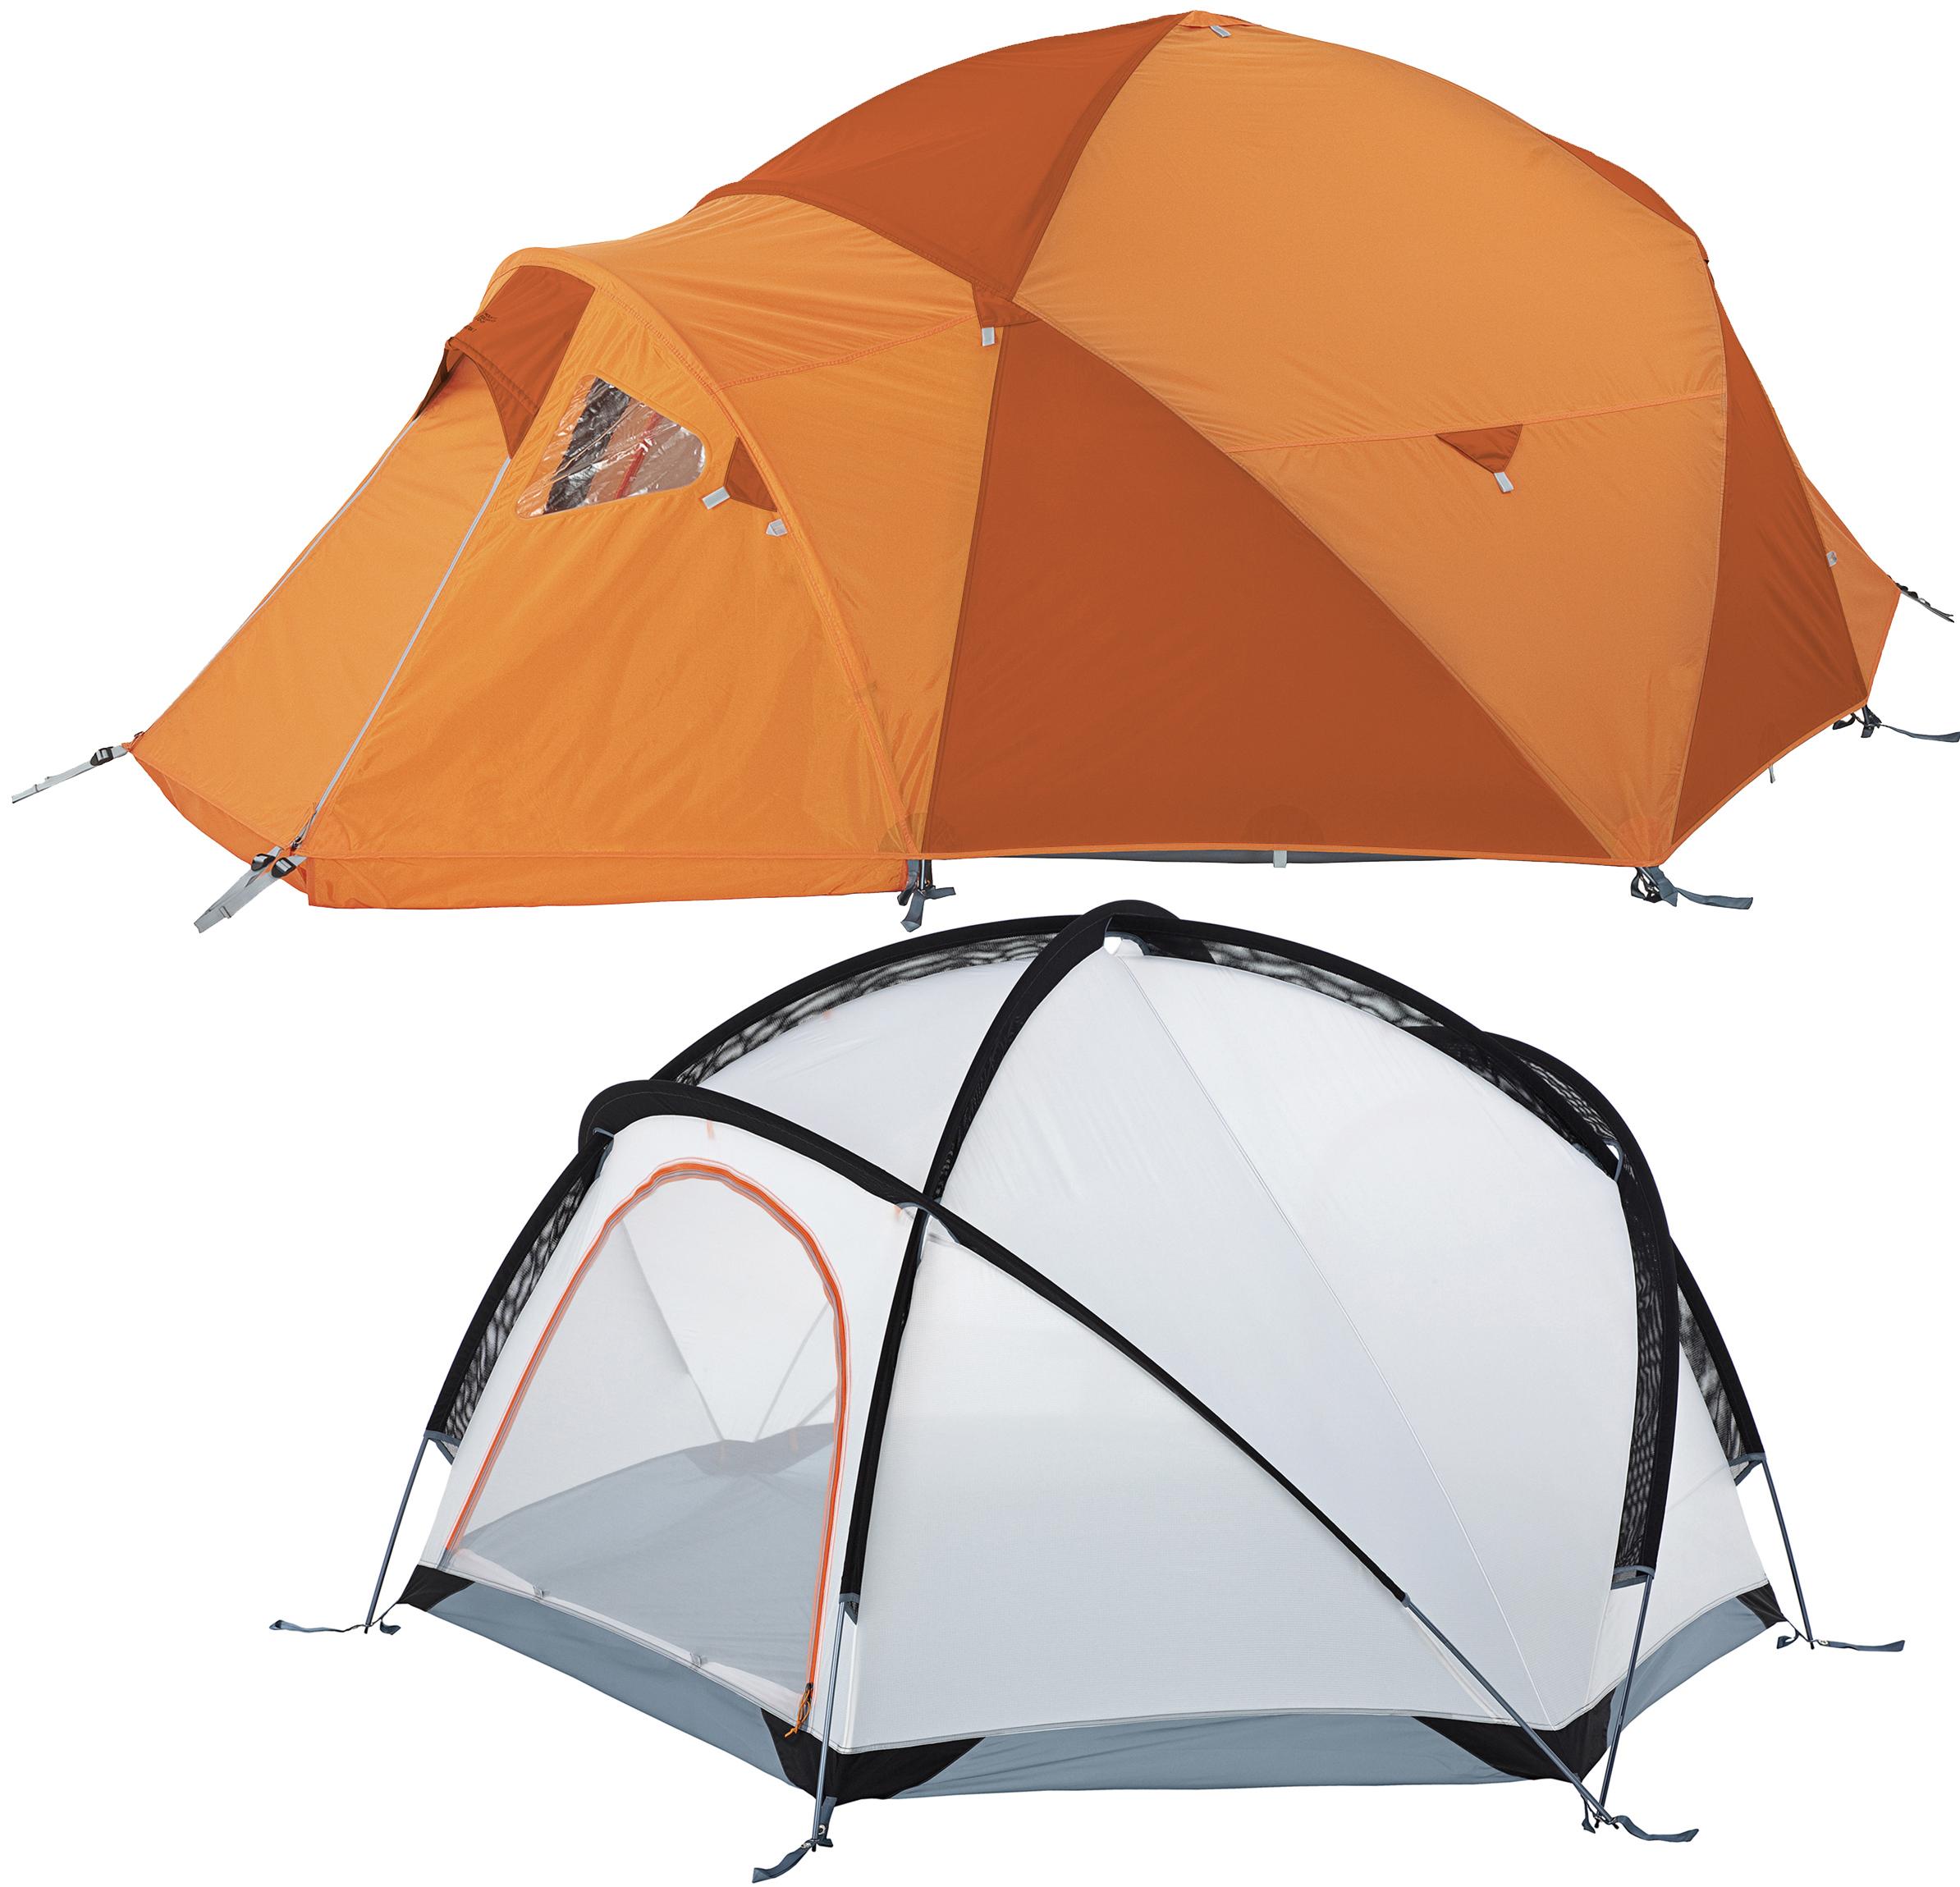 sc 1 st  MEC & MEC Nunatak 3 Tent